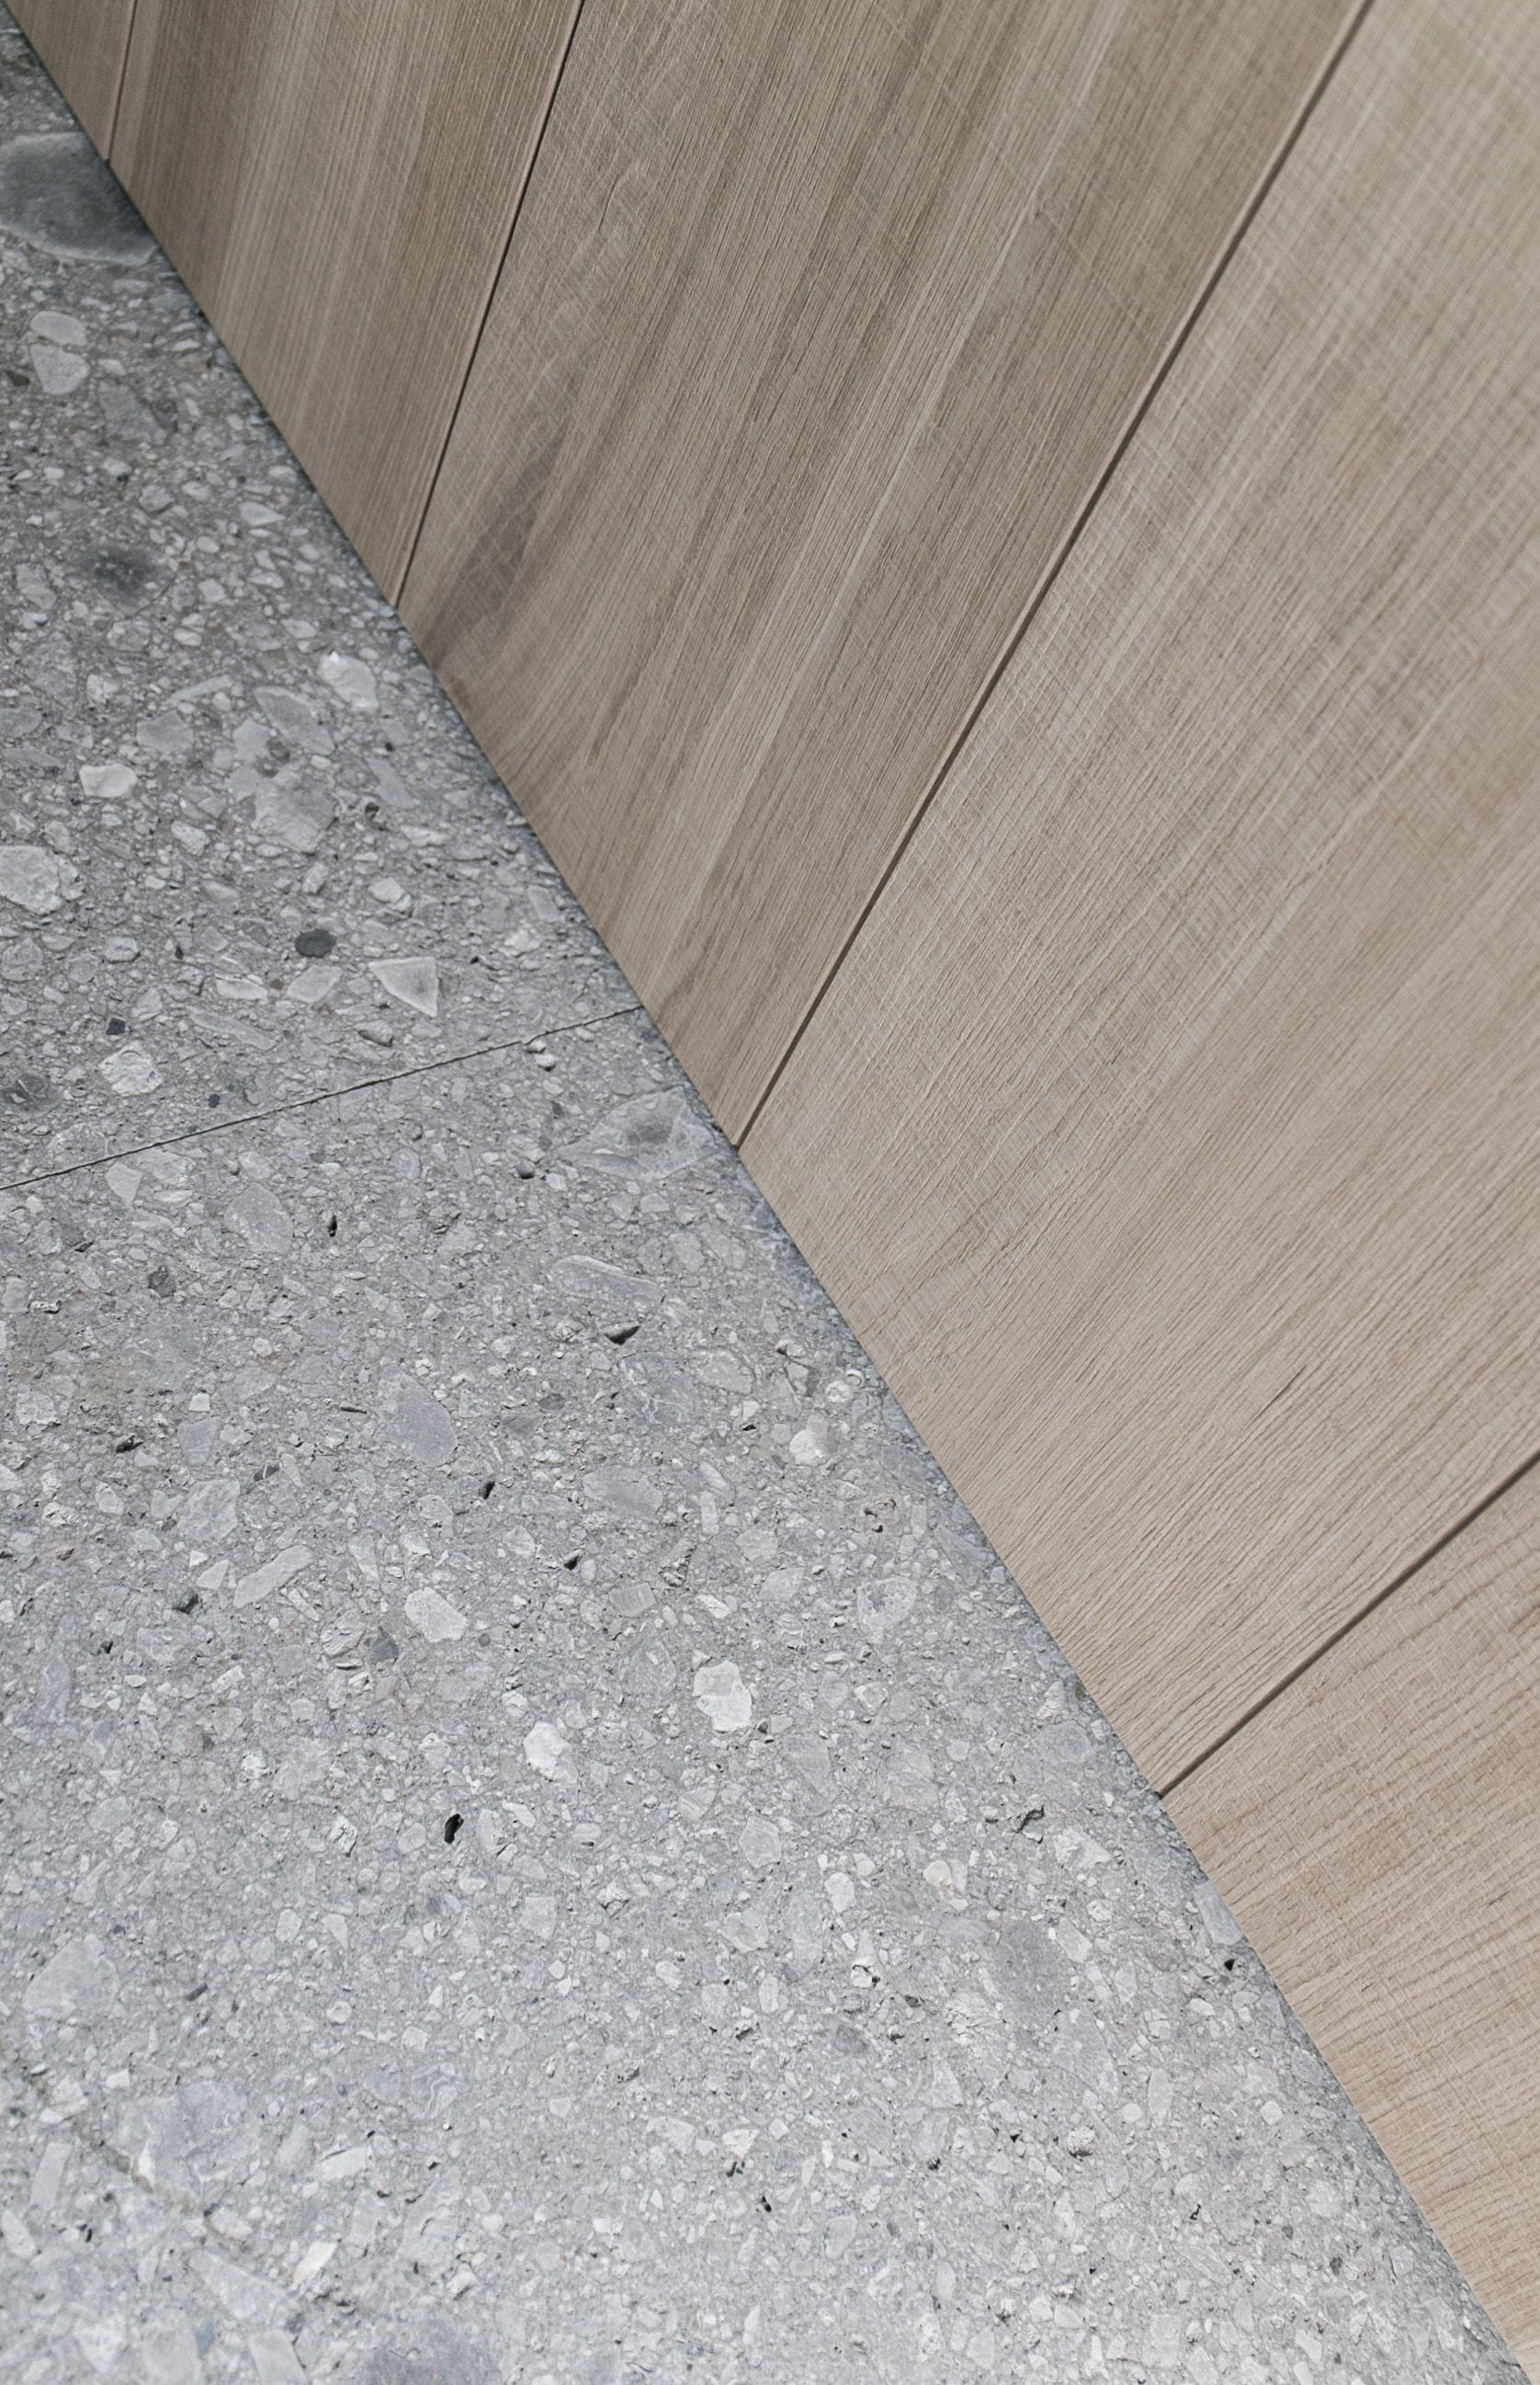 Italian Marble Tile Floor : Italy provincia di foggia serpeggiante marble composite